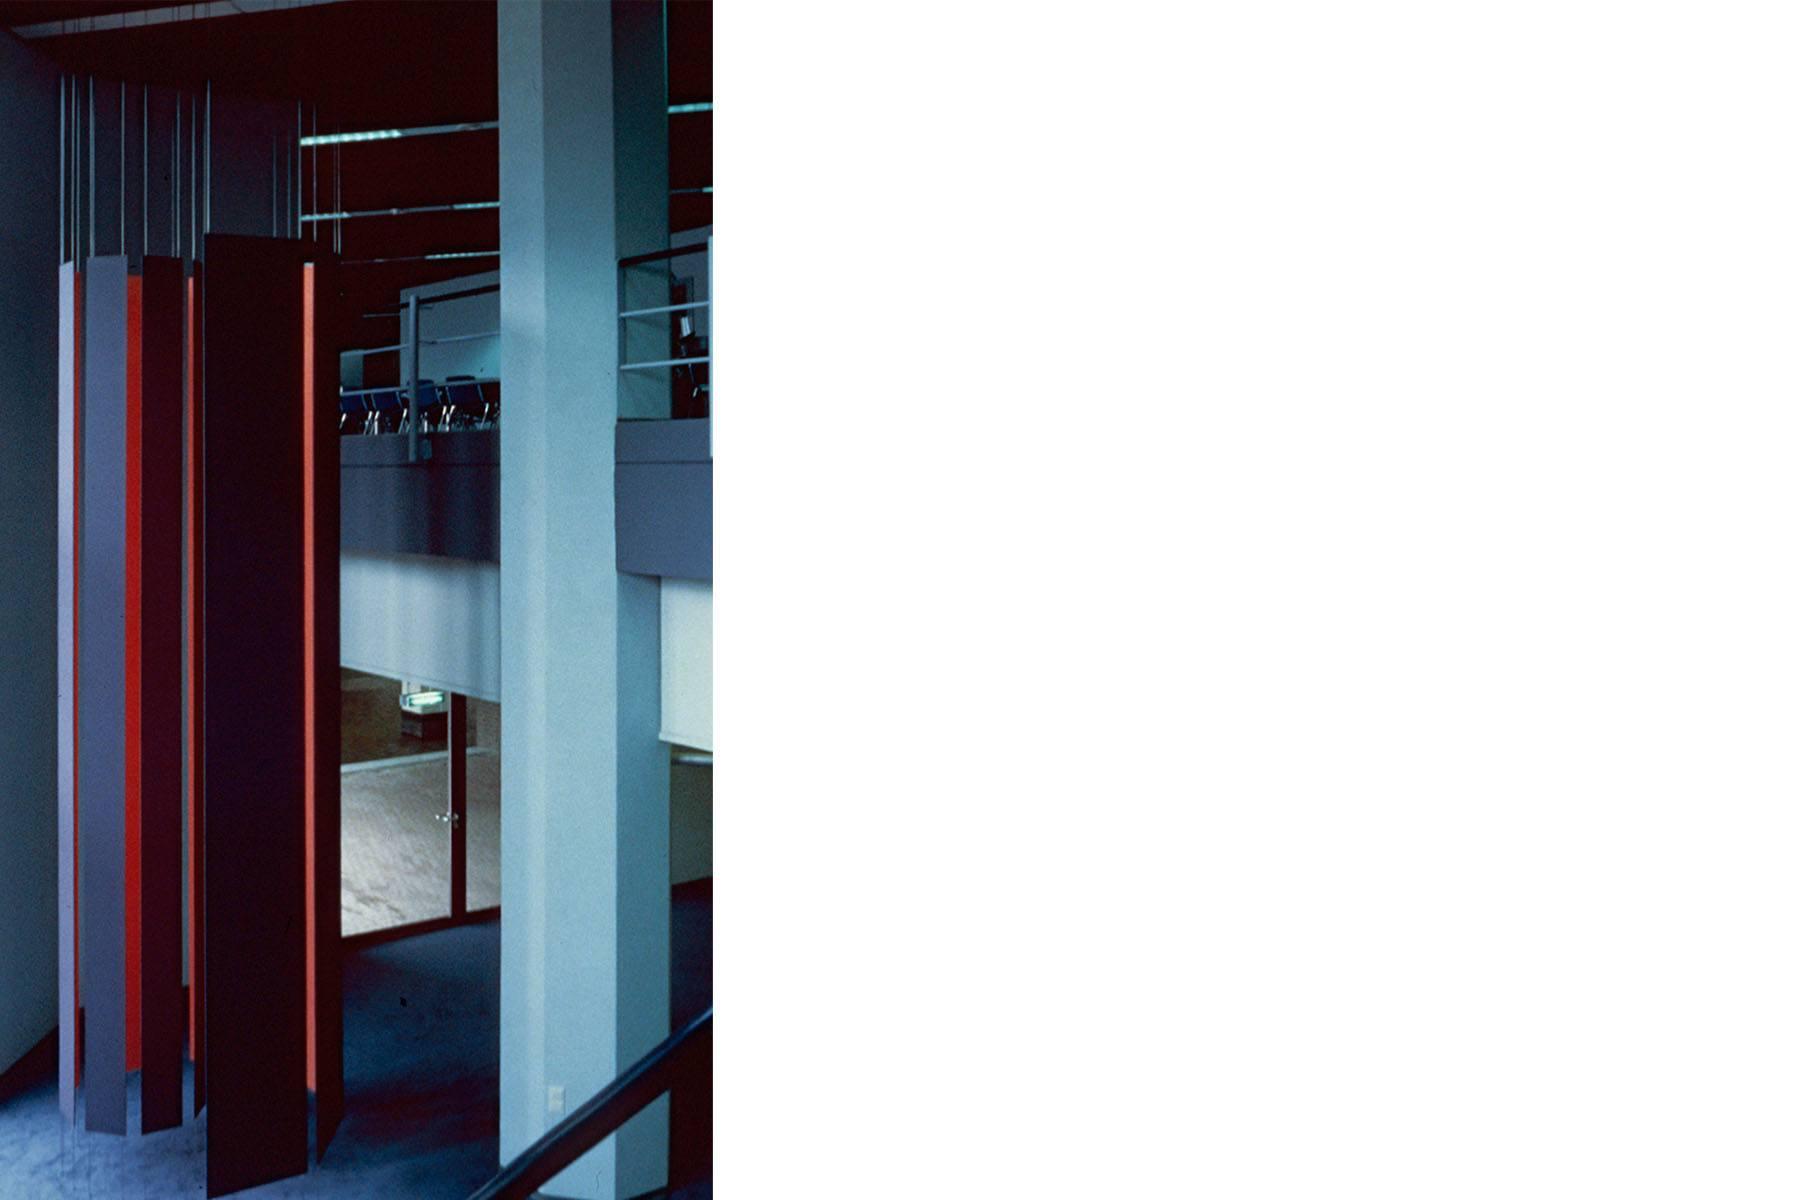 Utrecht / Rabobank / 1984